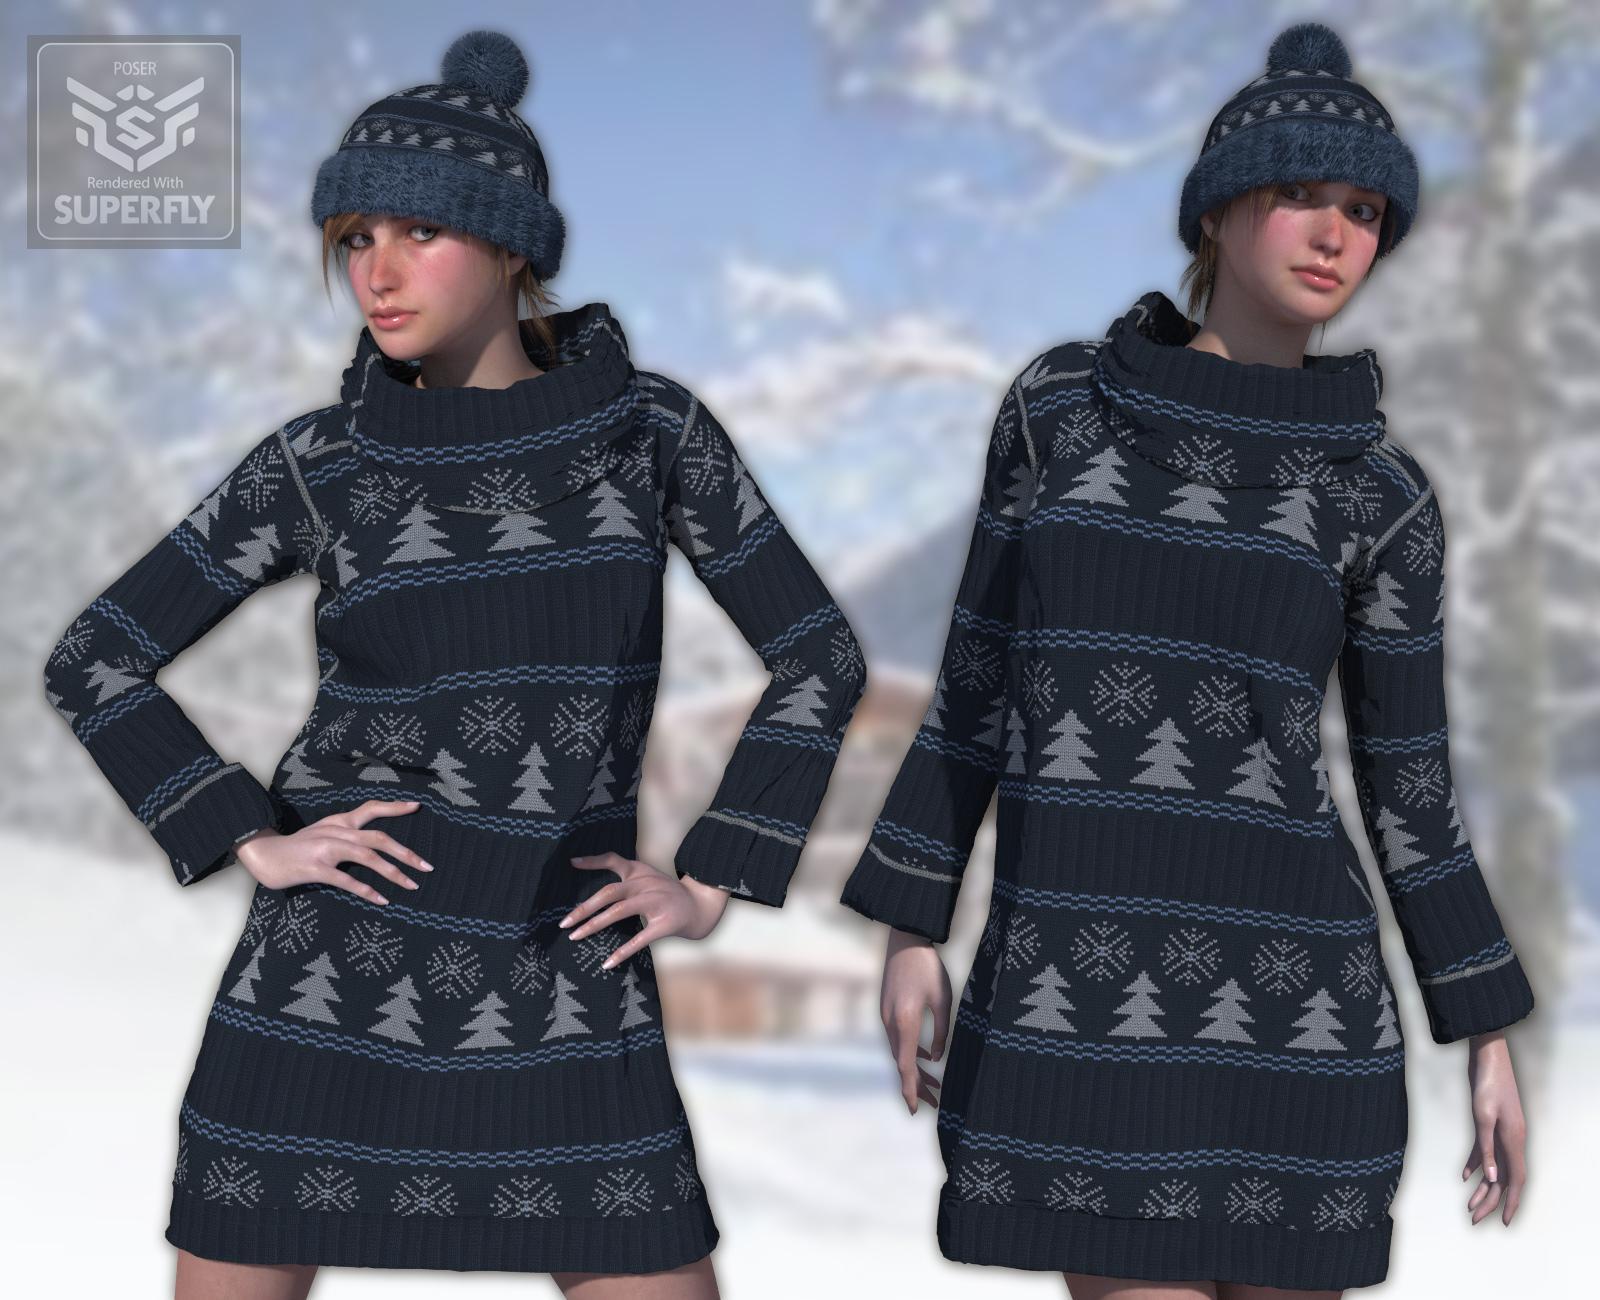 Wintercap promo 1